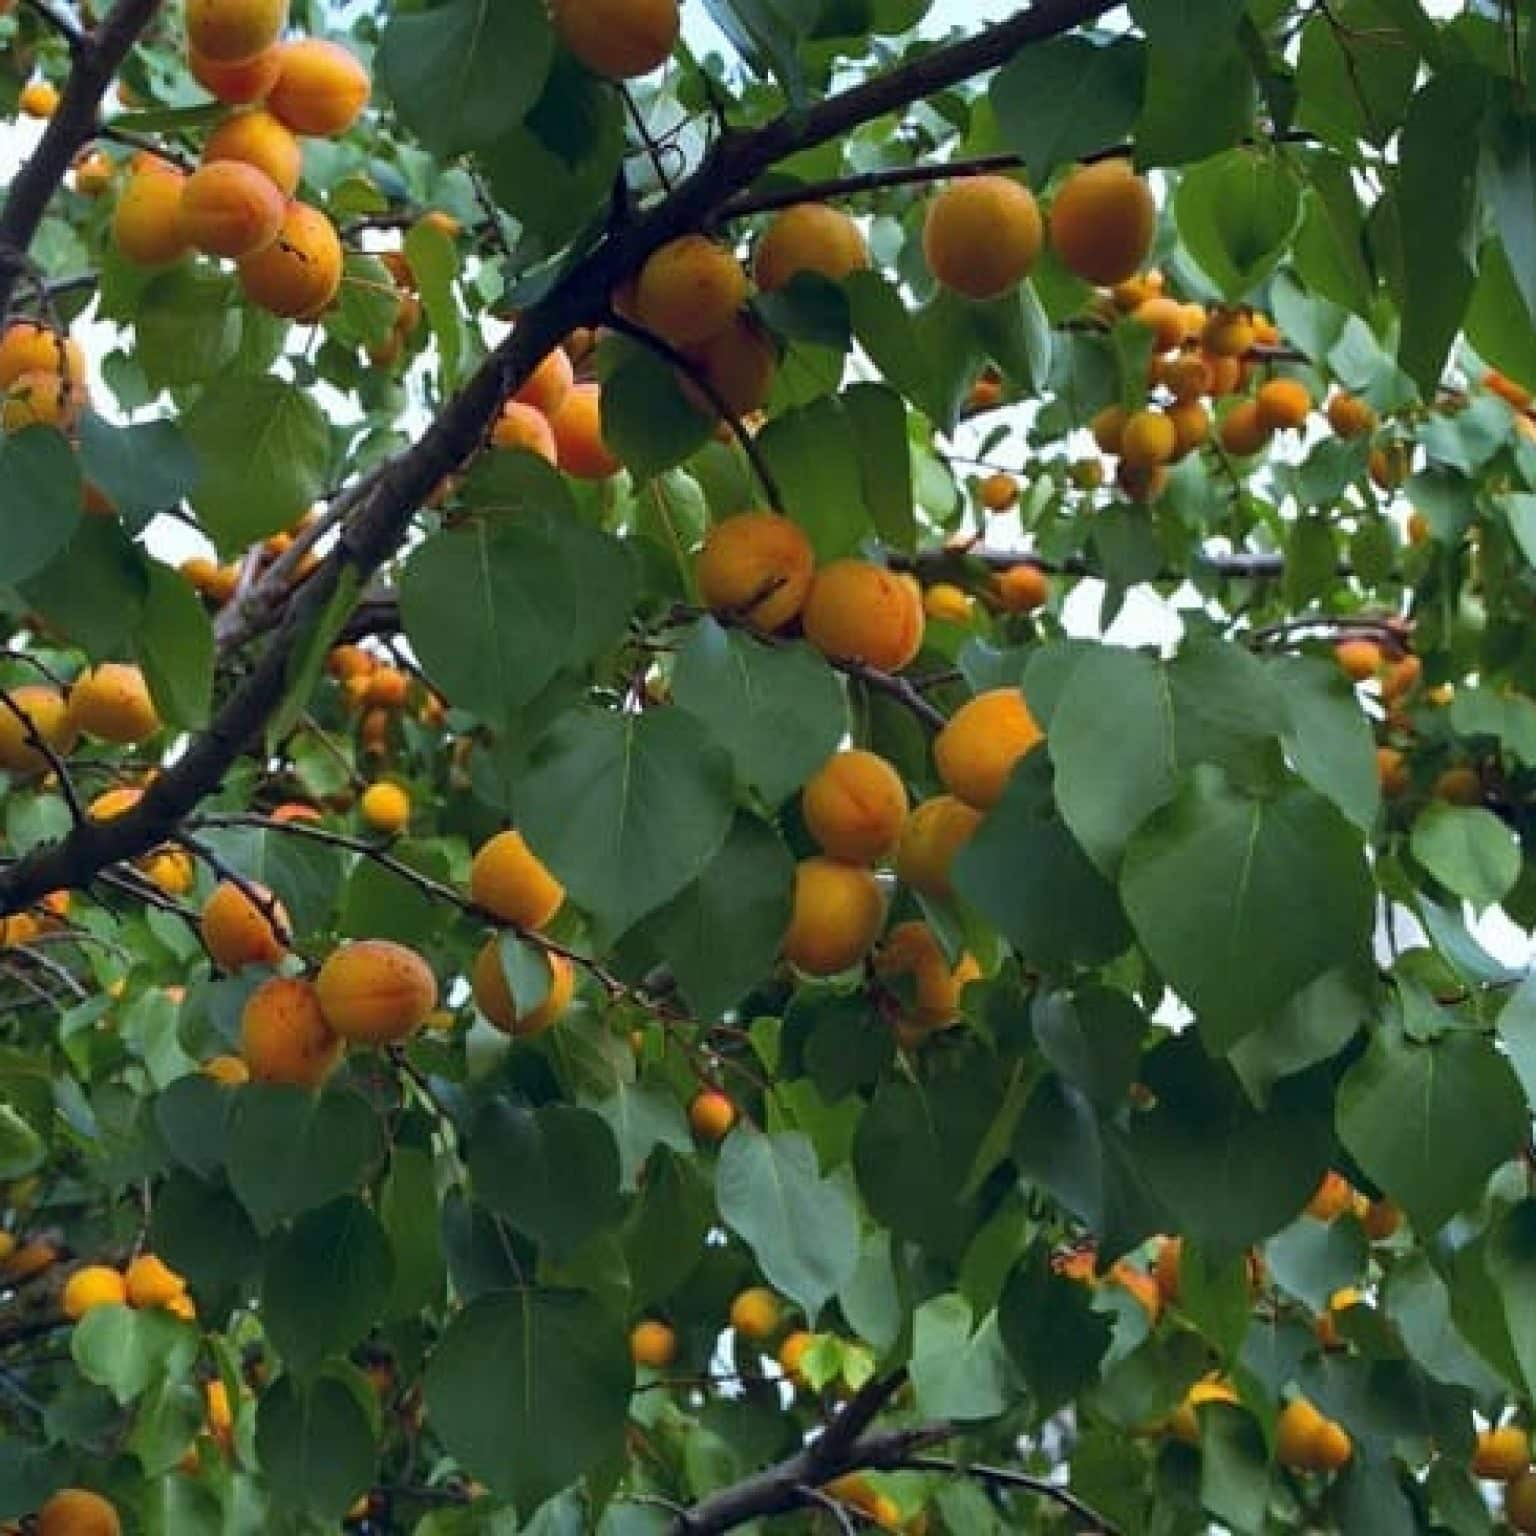 Плодоношение абрикоса: проблемы и их решение